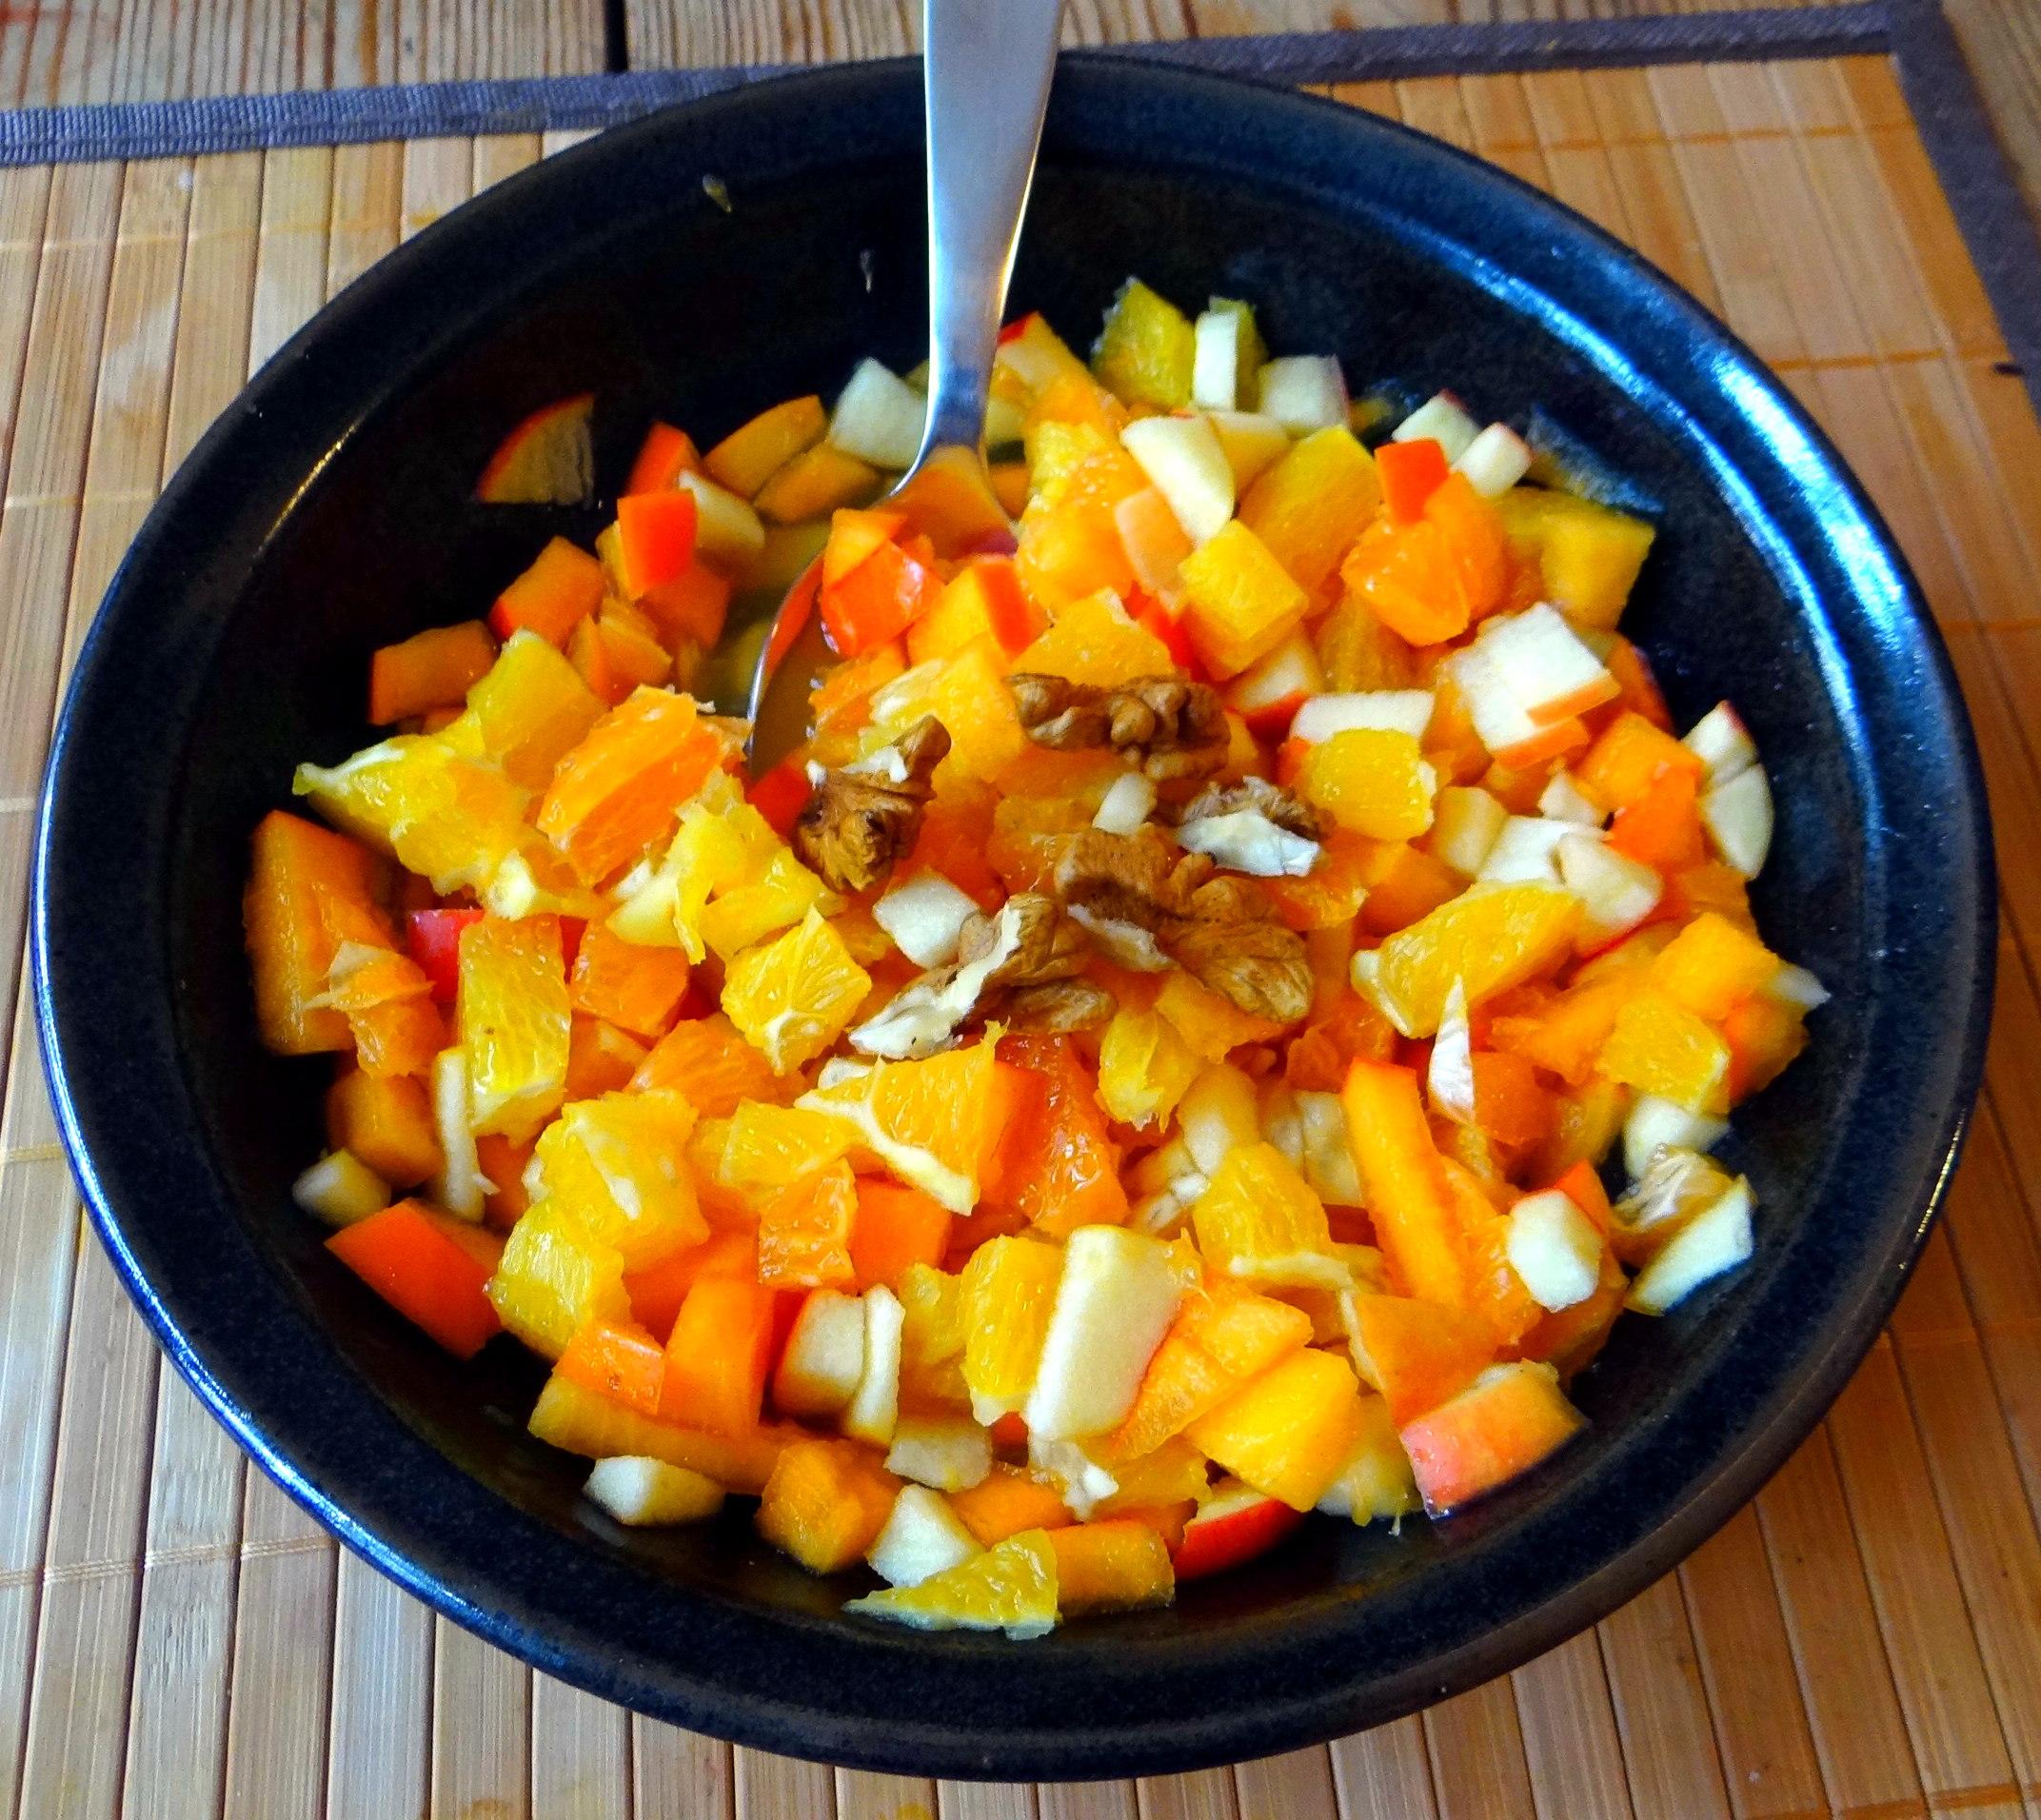 Rote Beete Gemüse,Geräucherte Forelle,Kartoffeln,Obstsalat (17)